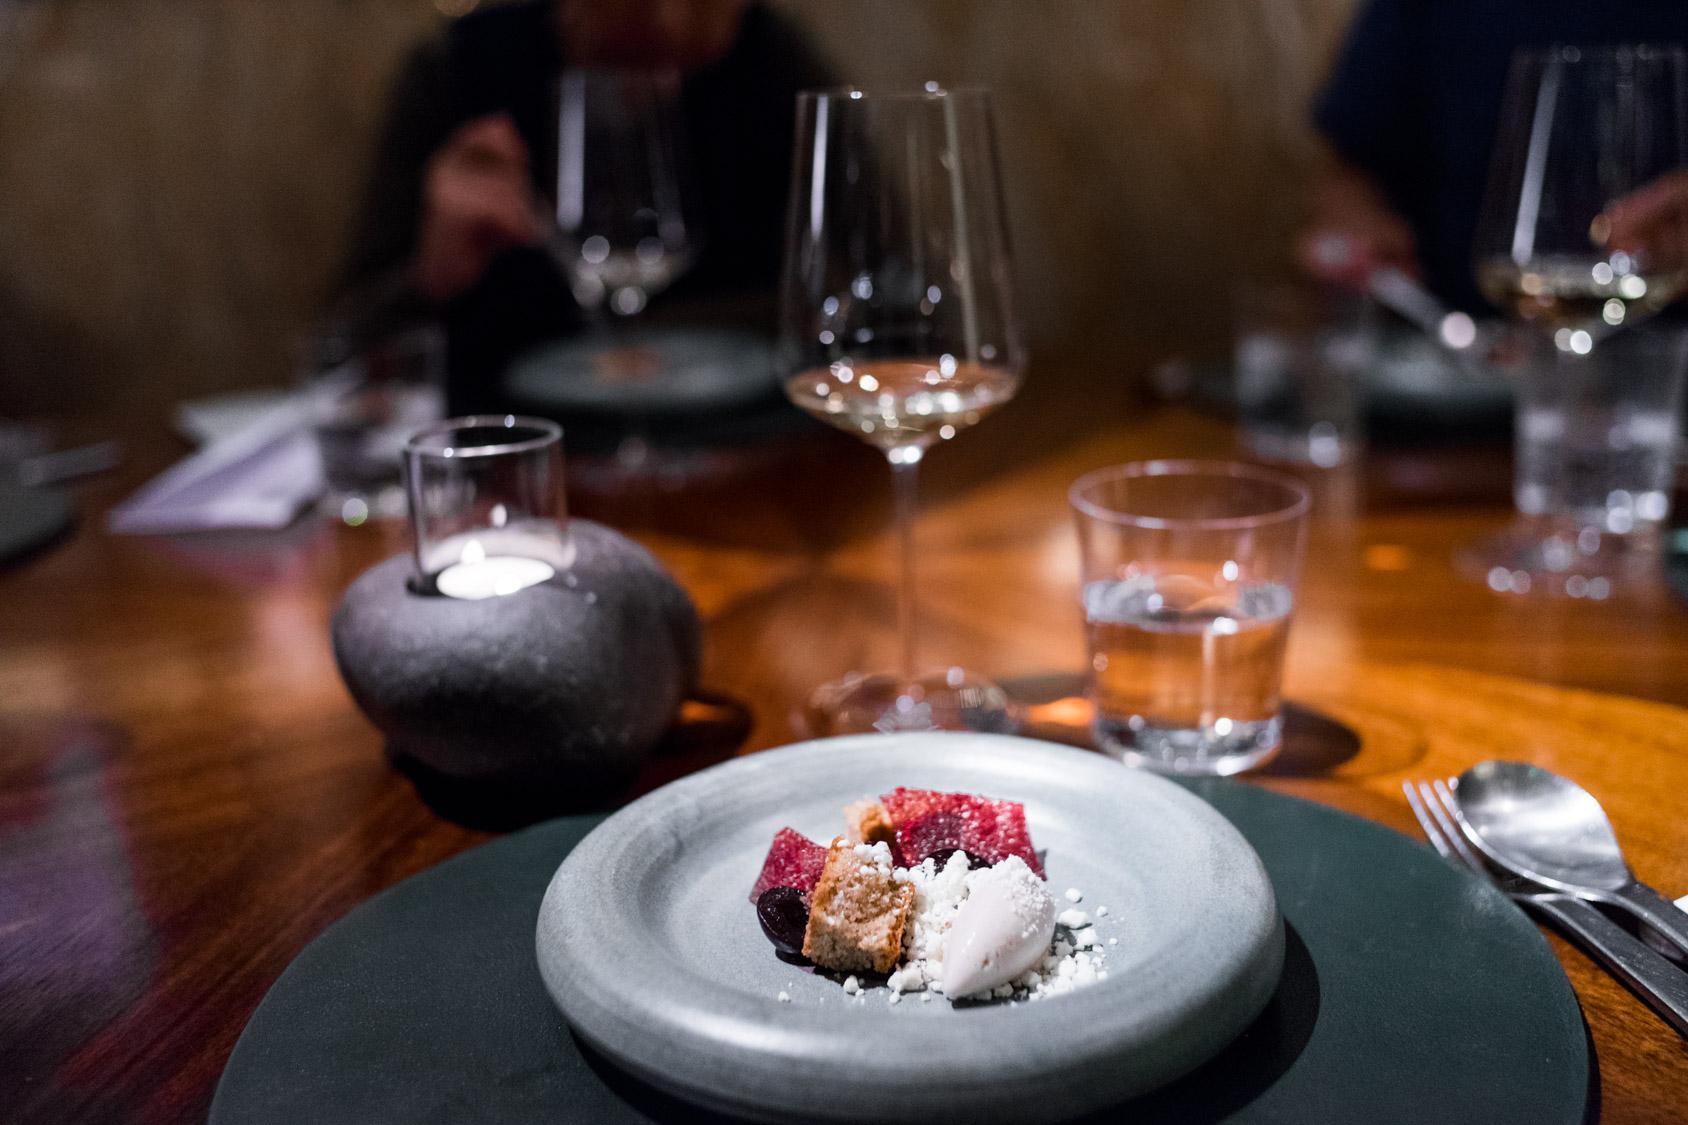 Meadowsweet cake, cherries, pine and sheep's yoghurt